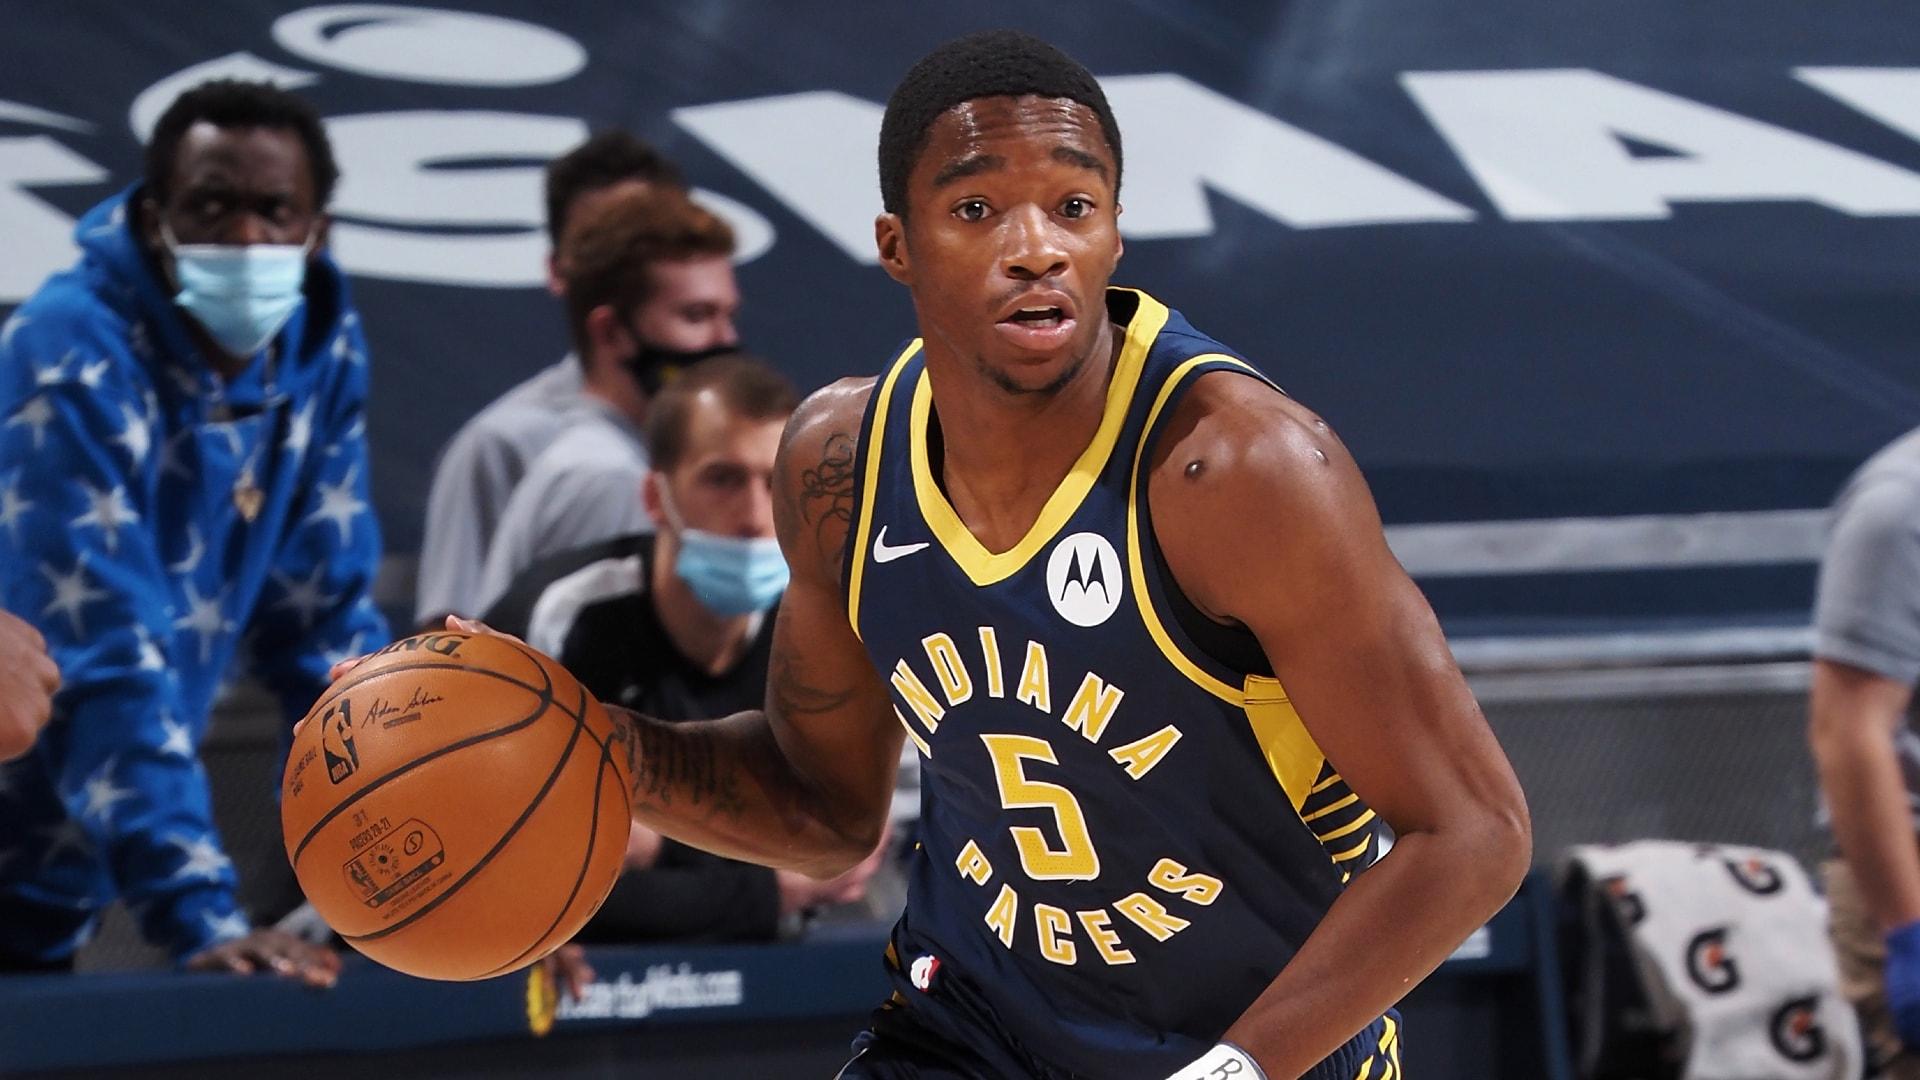 Pacers guard Edmond Sumner undergoes successful surgery on torn Achilles